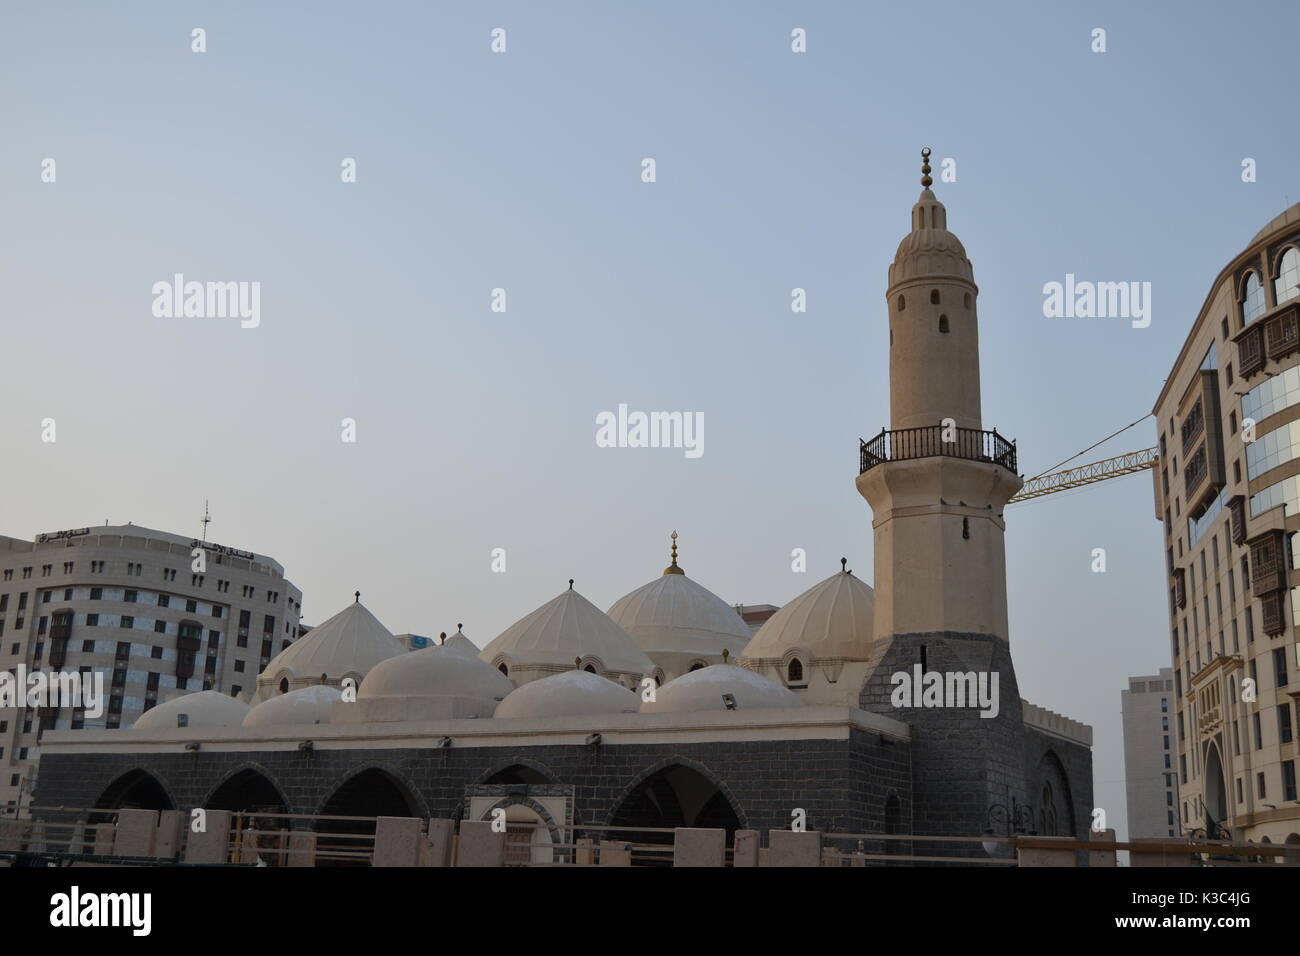 Gamame masjid - Stock Image